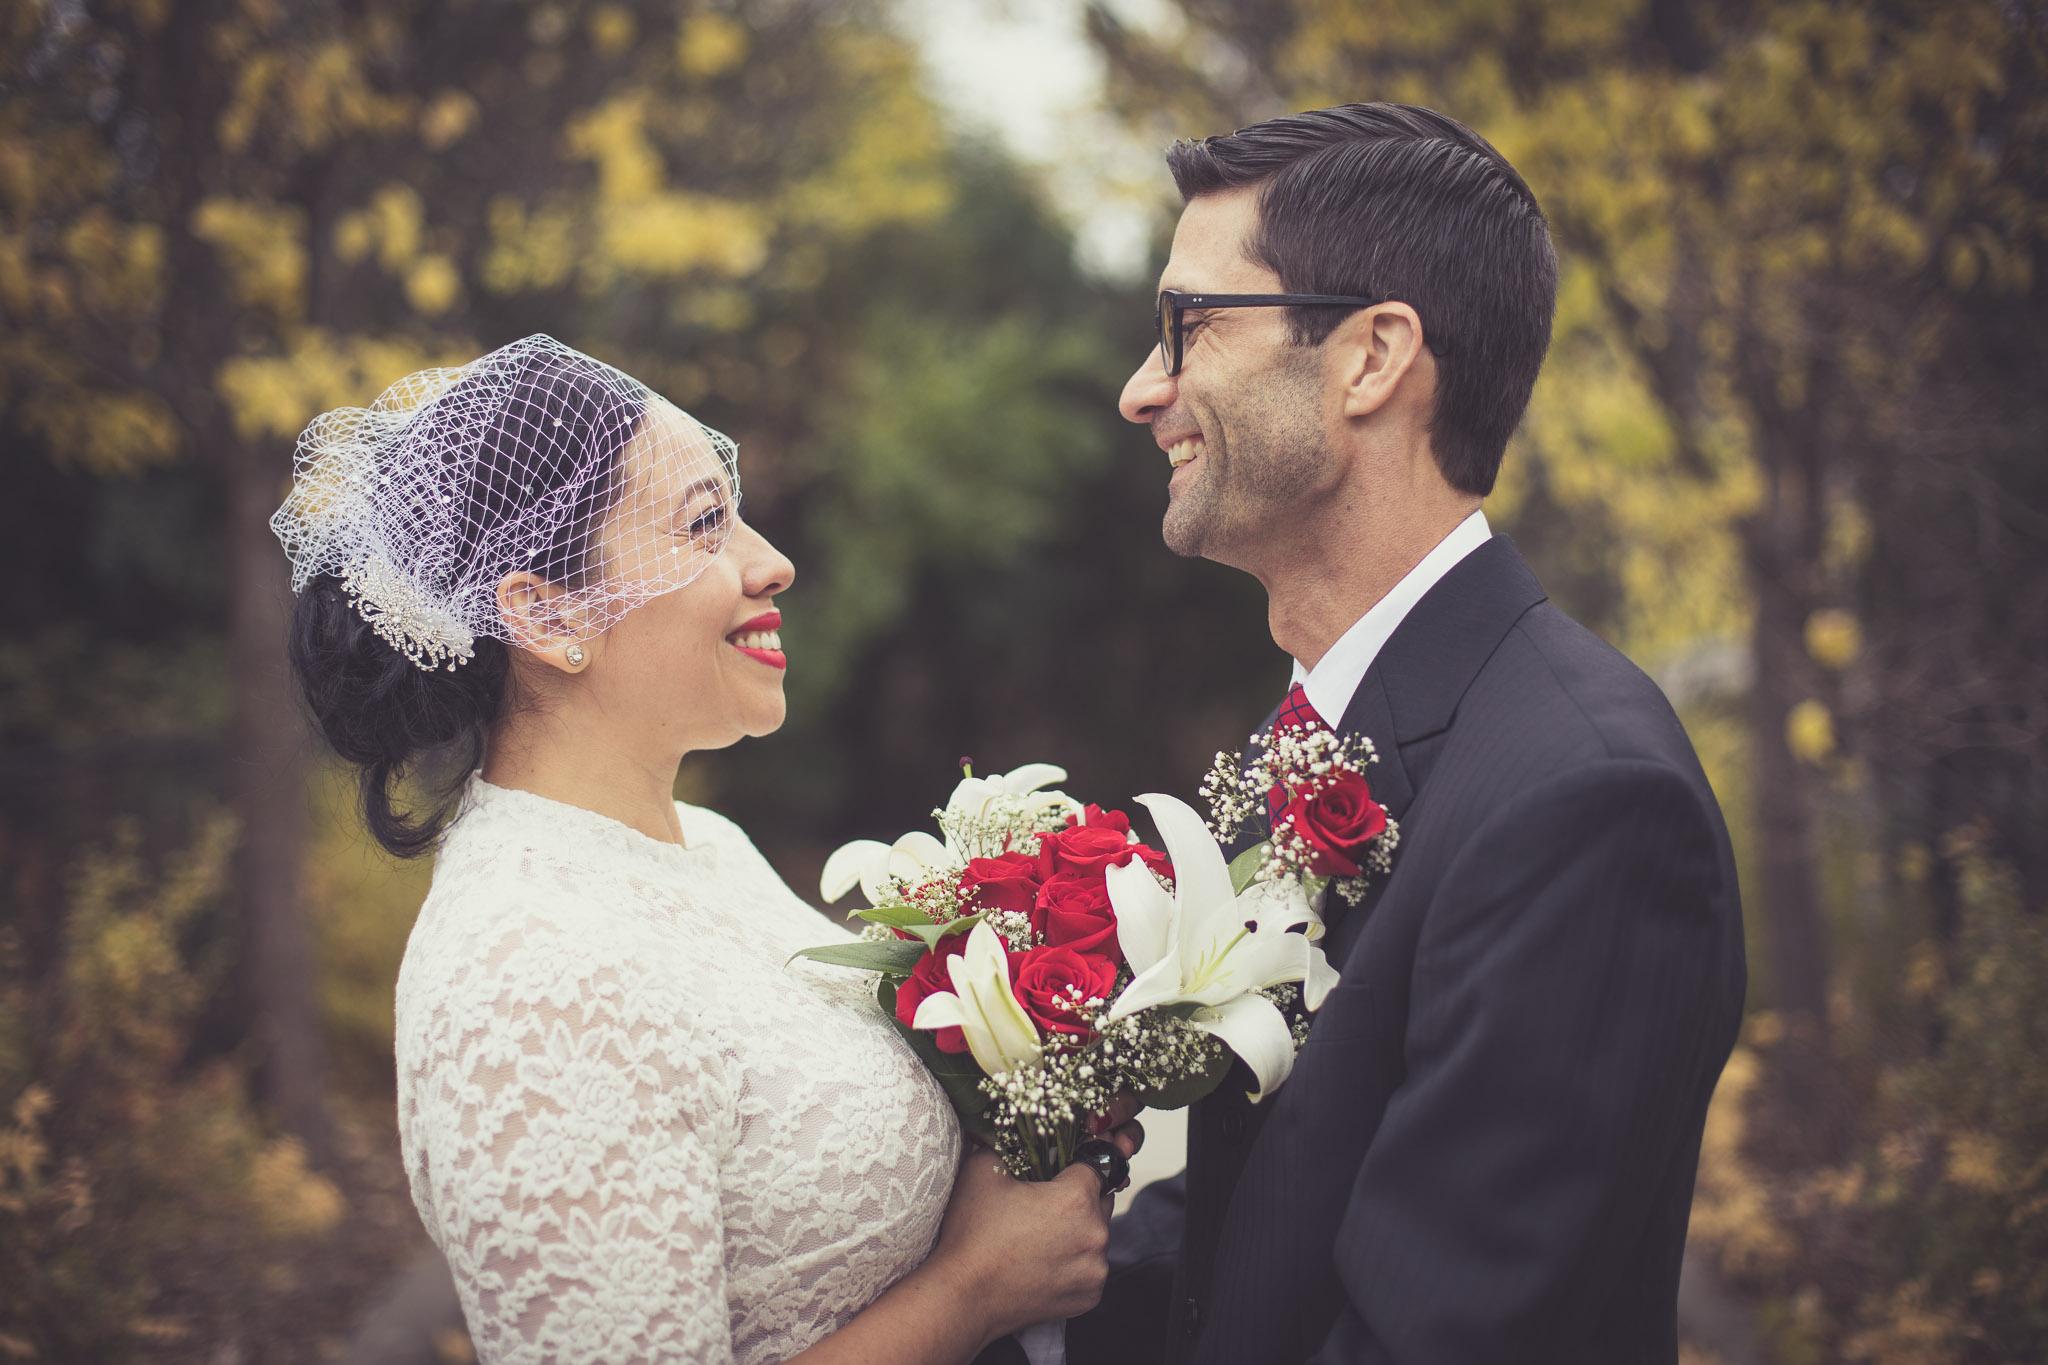 Geovanna-JP-wedding-shayne-gray-web-0418.jpg